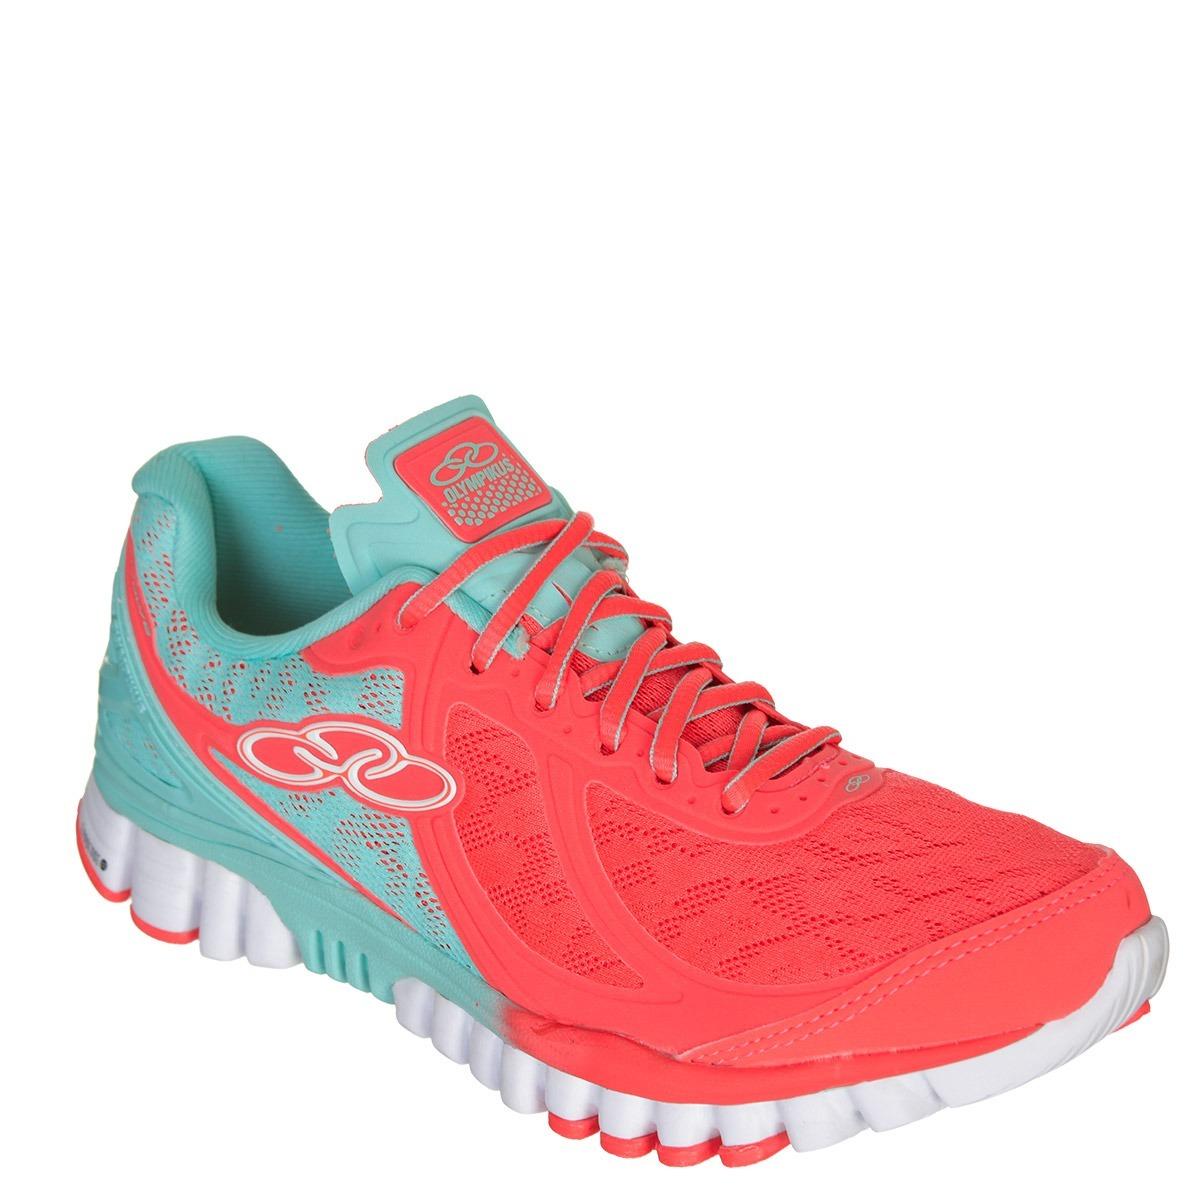 69eed5a88ea tênis olympikus involve feminino caminhada corrida. Carregando zoom.